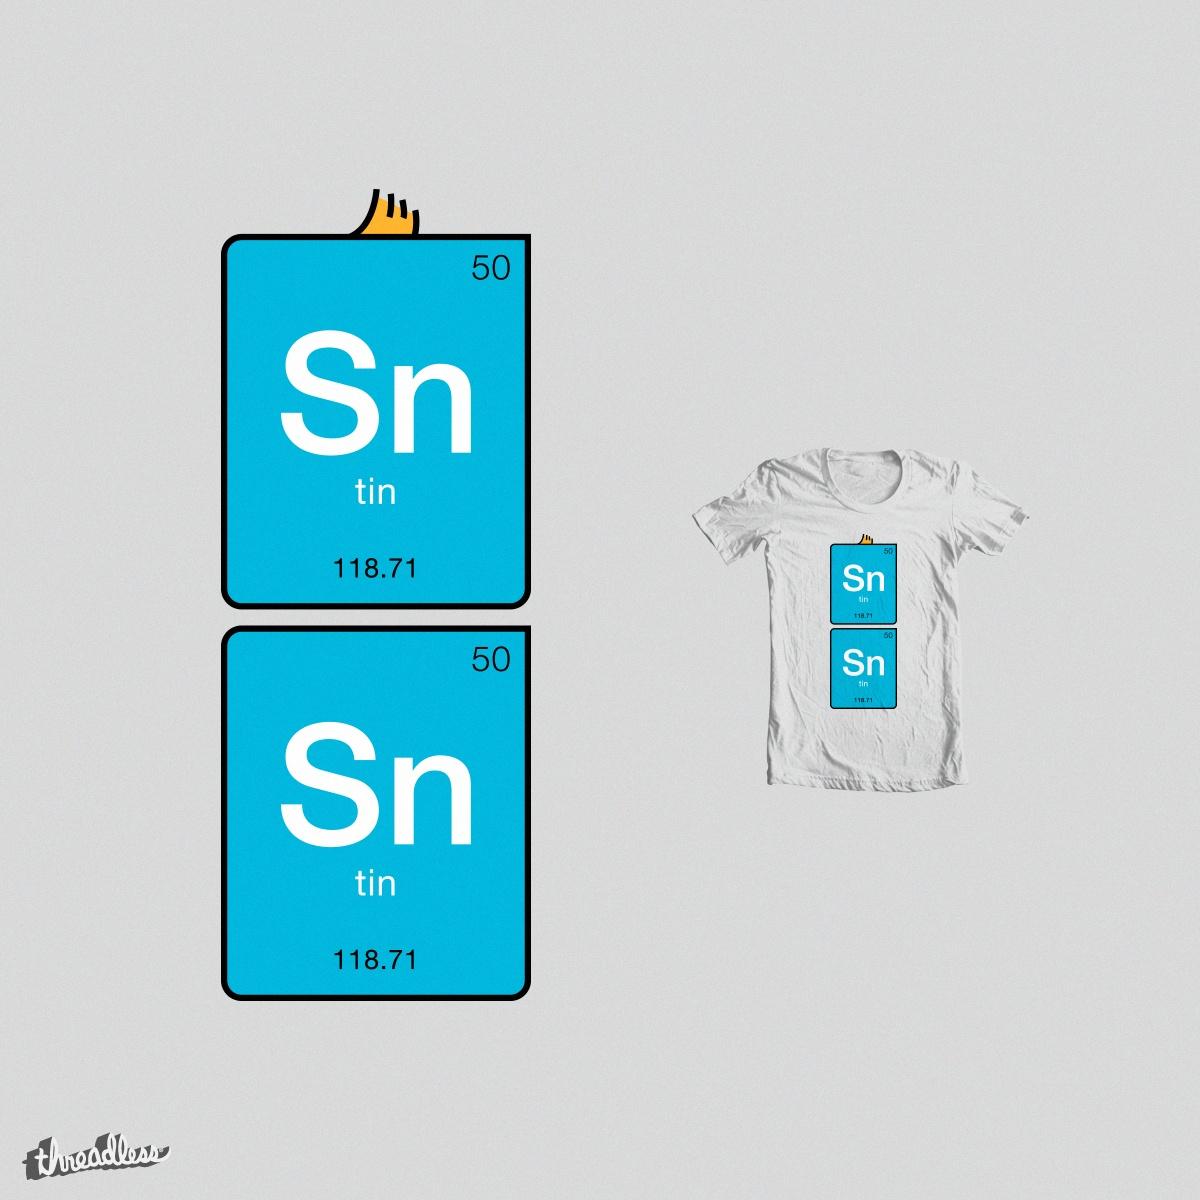 Sn Sn by Haasbroek on Threadless